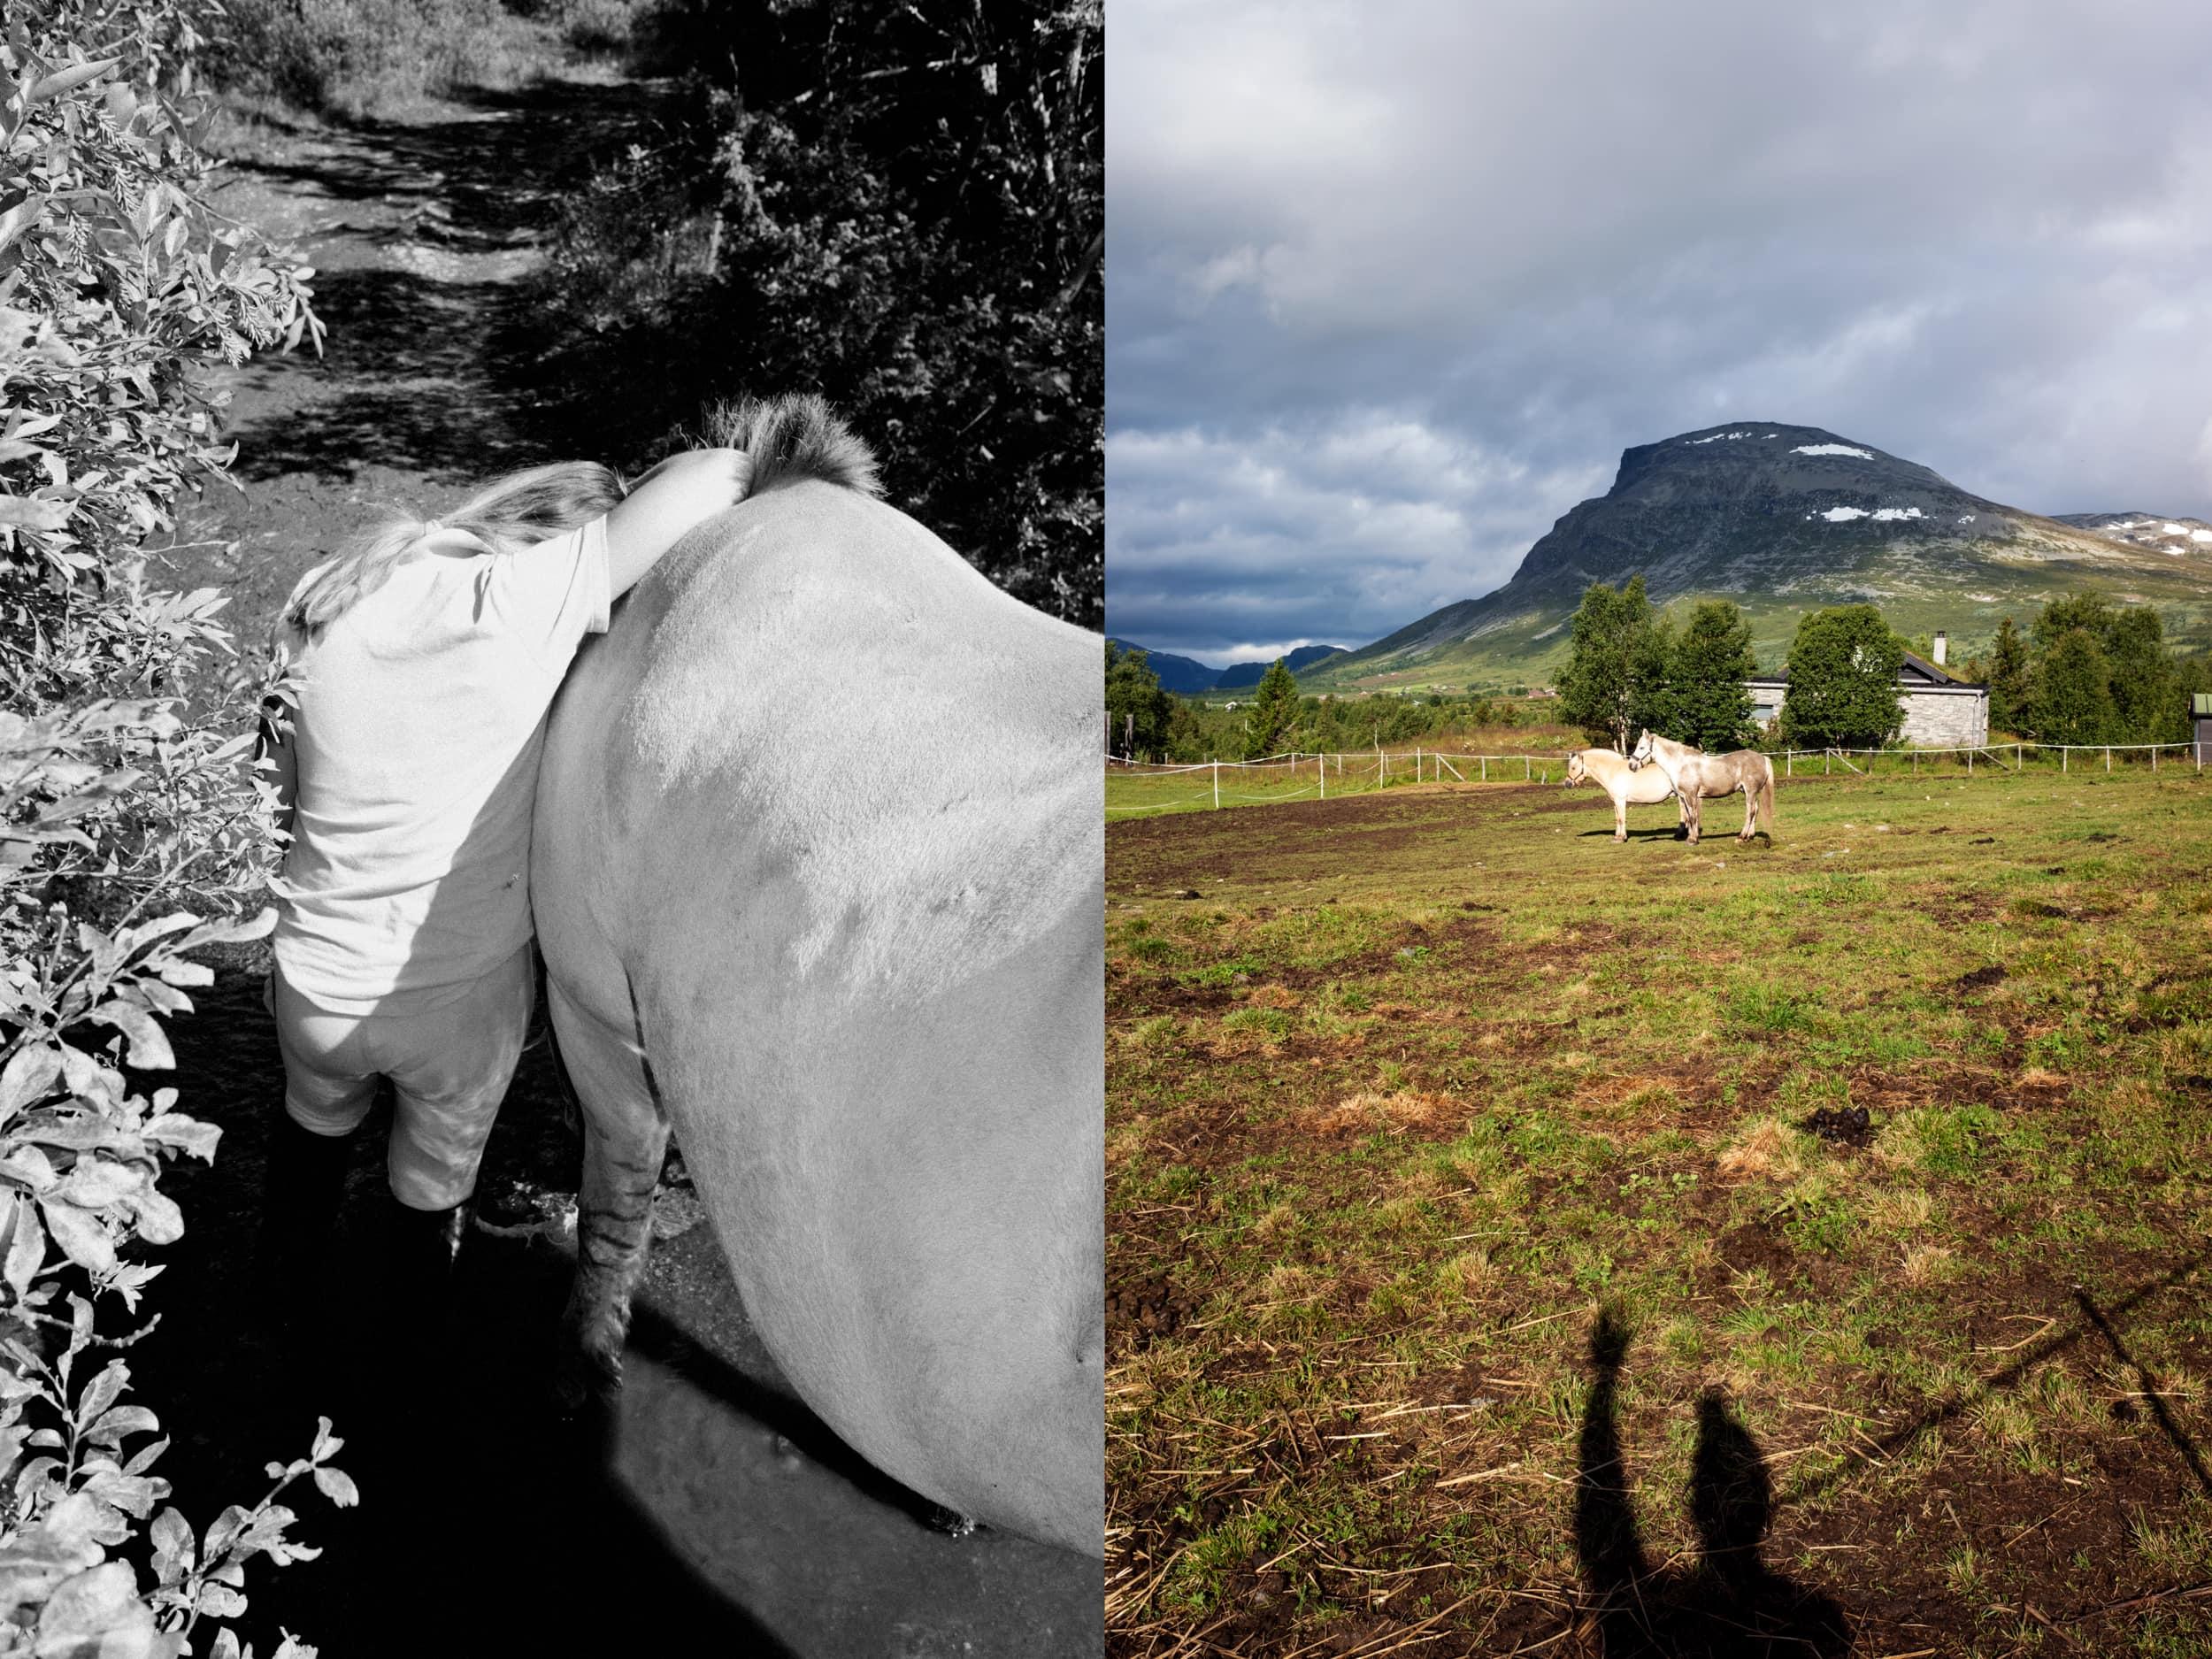 Kimm Saatvedt – Tok en rideleir sommeren 2020